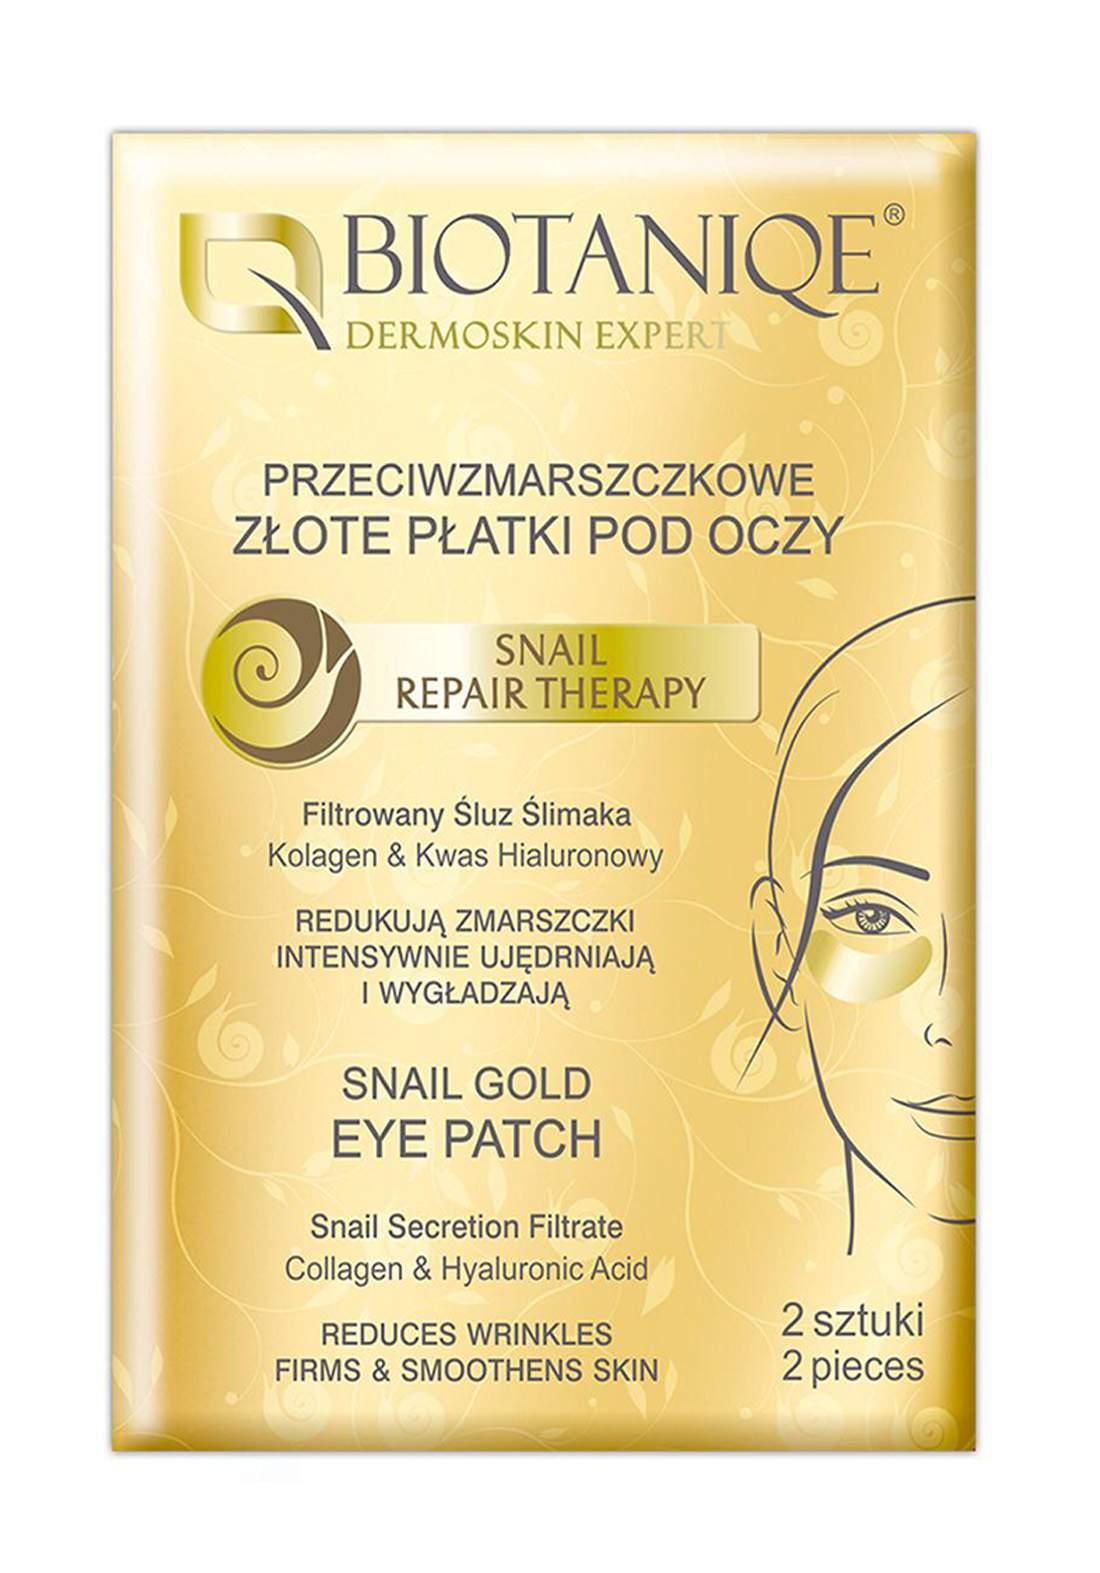 Biotaniqe Snail Gold Eye Patch 2pcs  شرائح لمعالجة الهالات